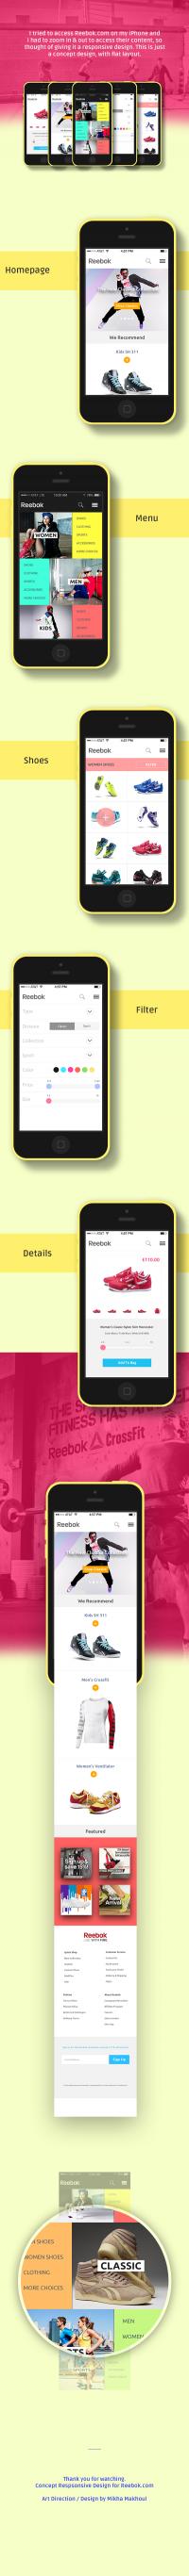 Reebok Mobile Site on